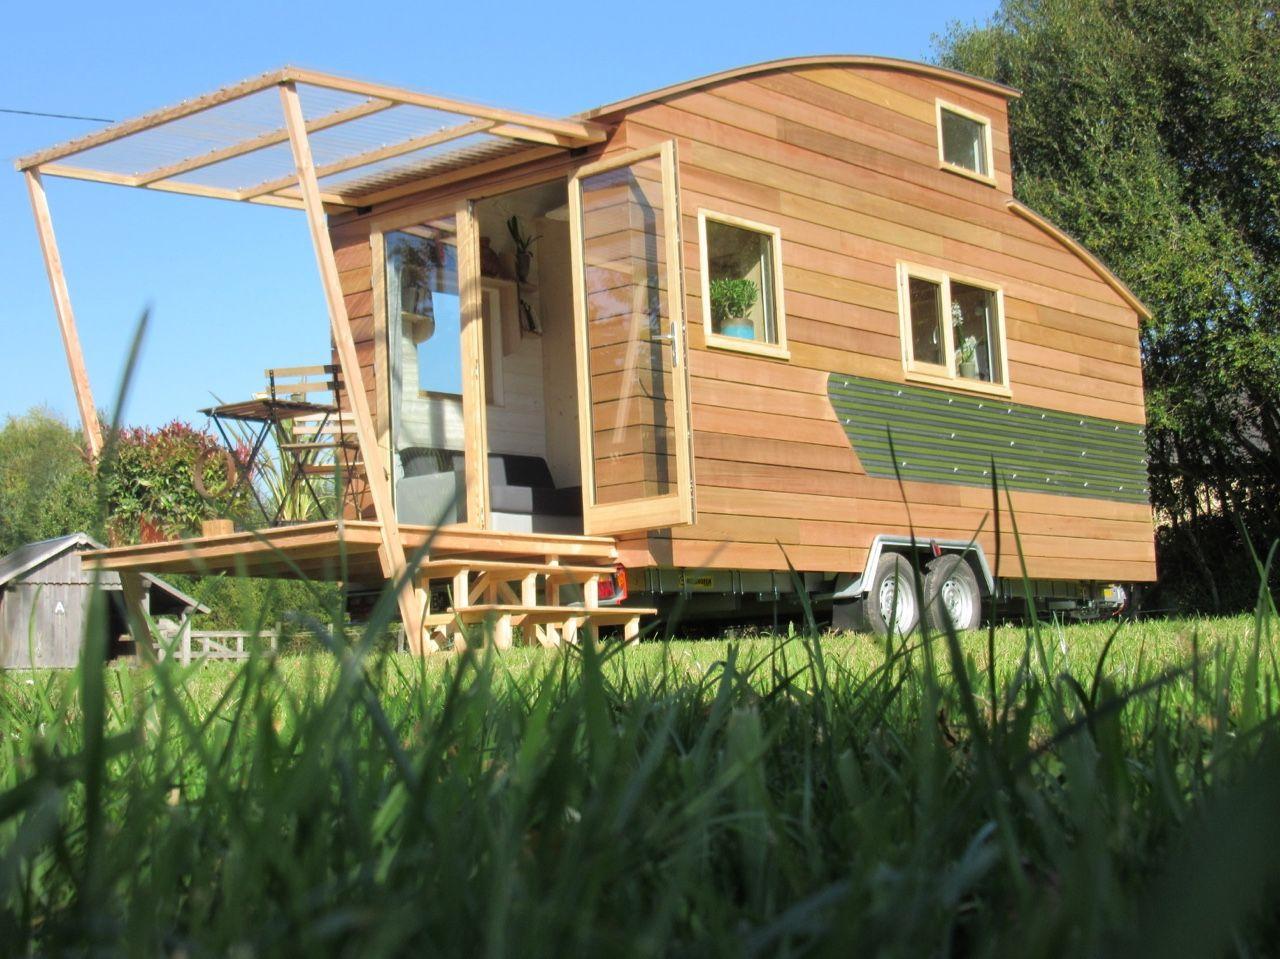 Alek Lisefski Tiny House tÉmoin | la tiny house france / hat tip to alek lisefski